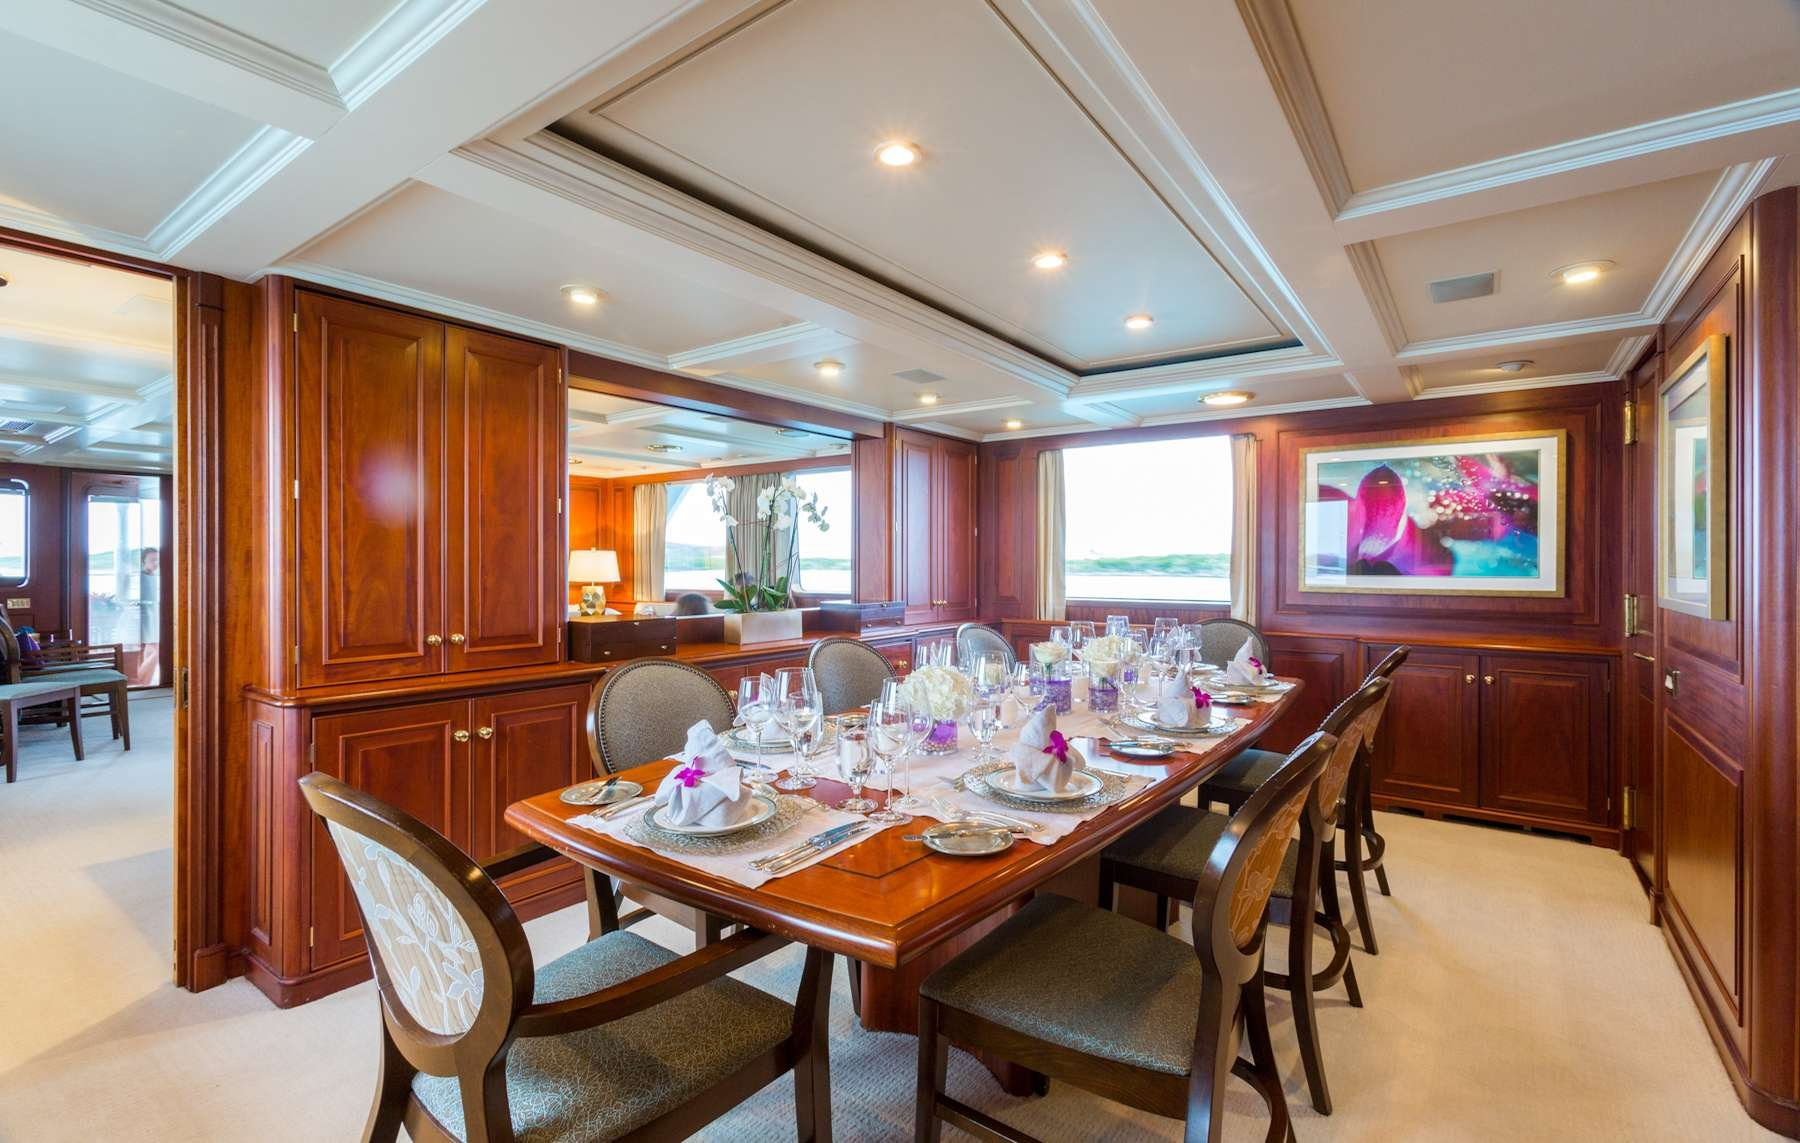 Motor Yacht 'LADY J' Formal Dining, 12 PAX, 9 Crew, 142.00 Ft, 43.00 Meters, Built 1997, Palmer Johnson, Refit Year 2017